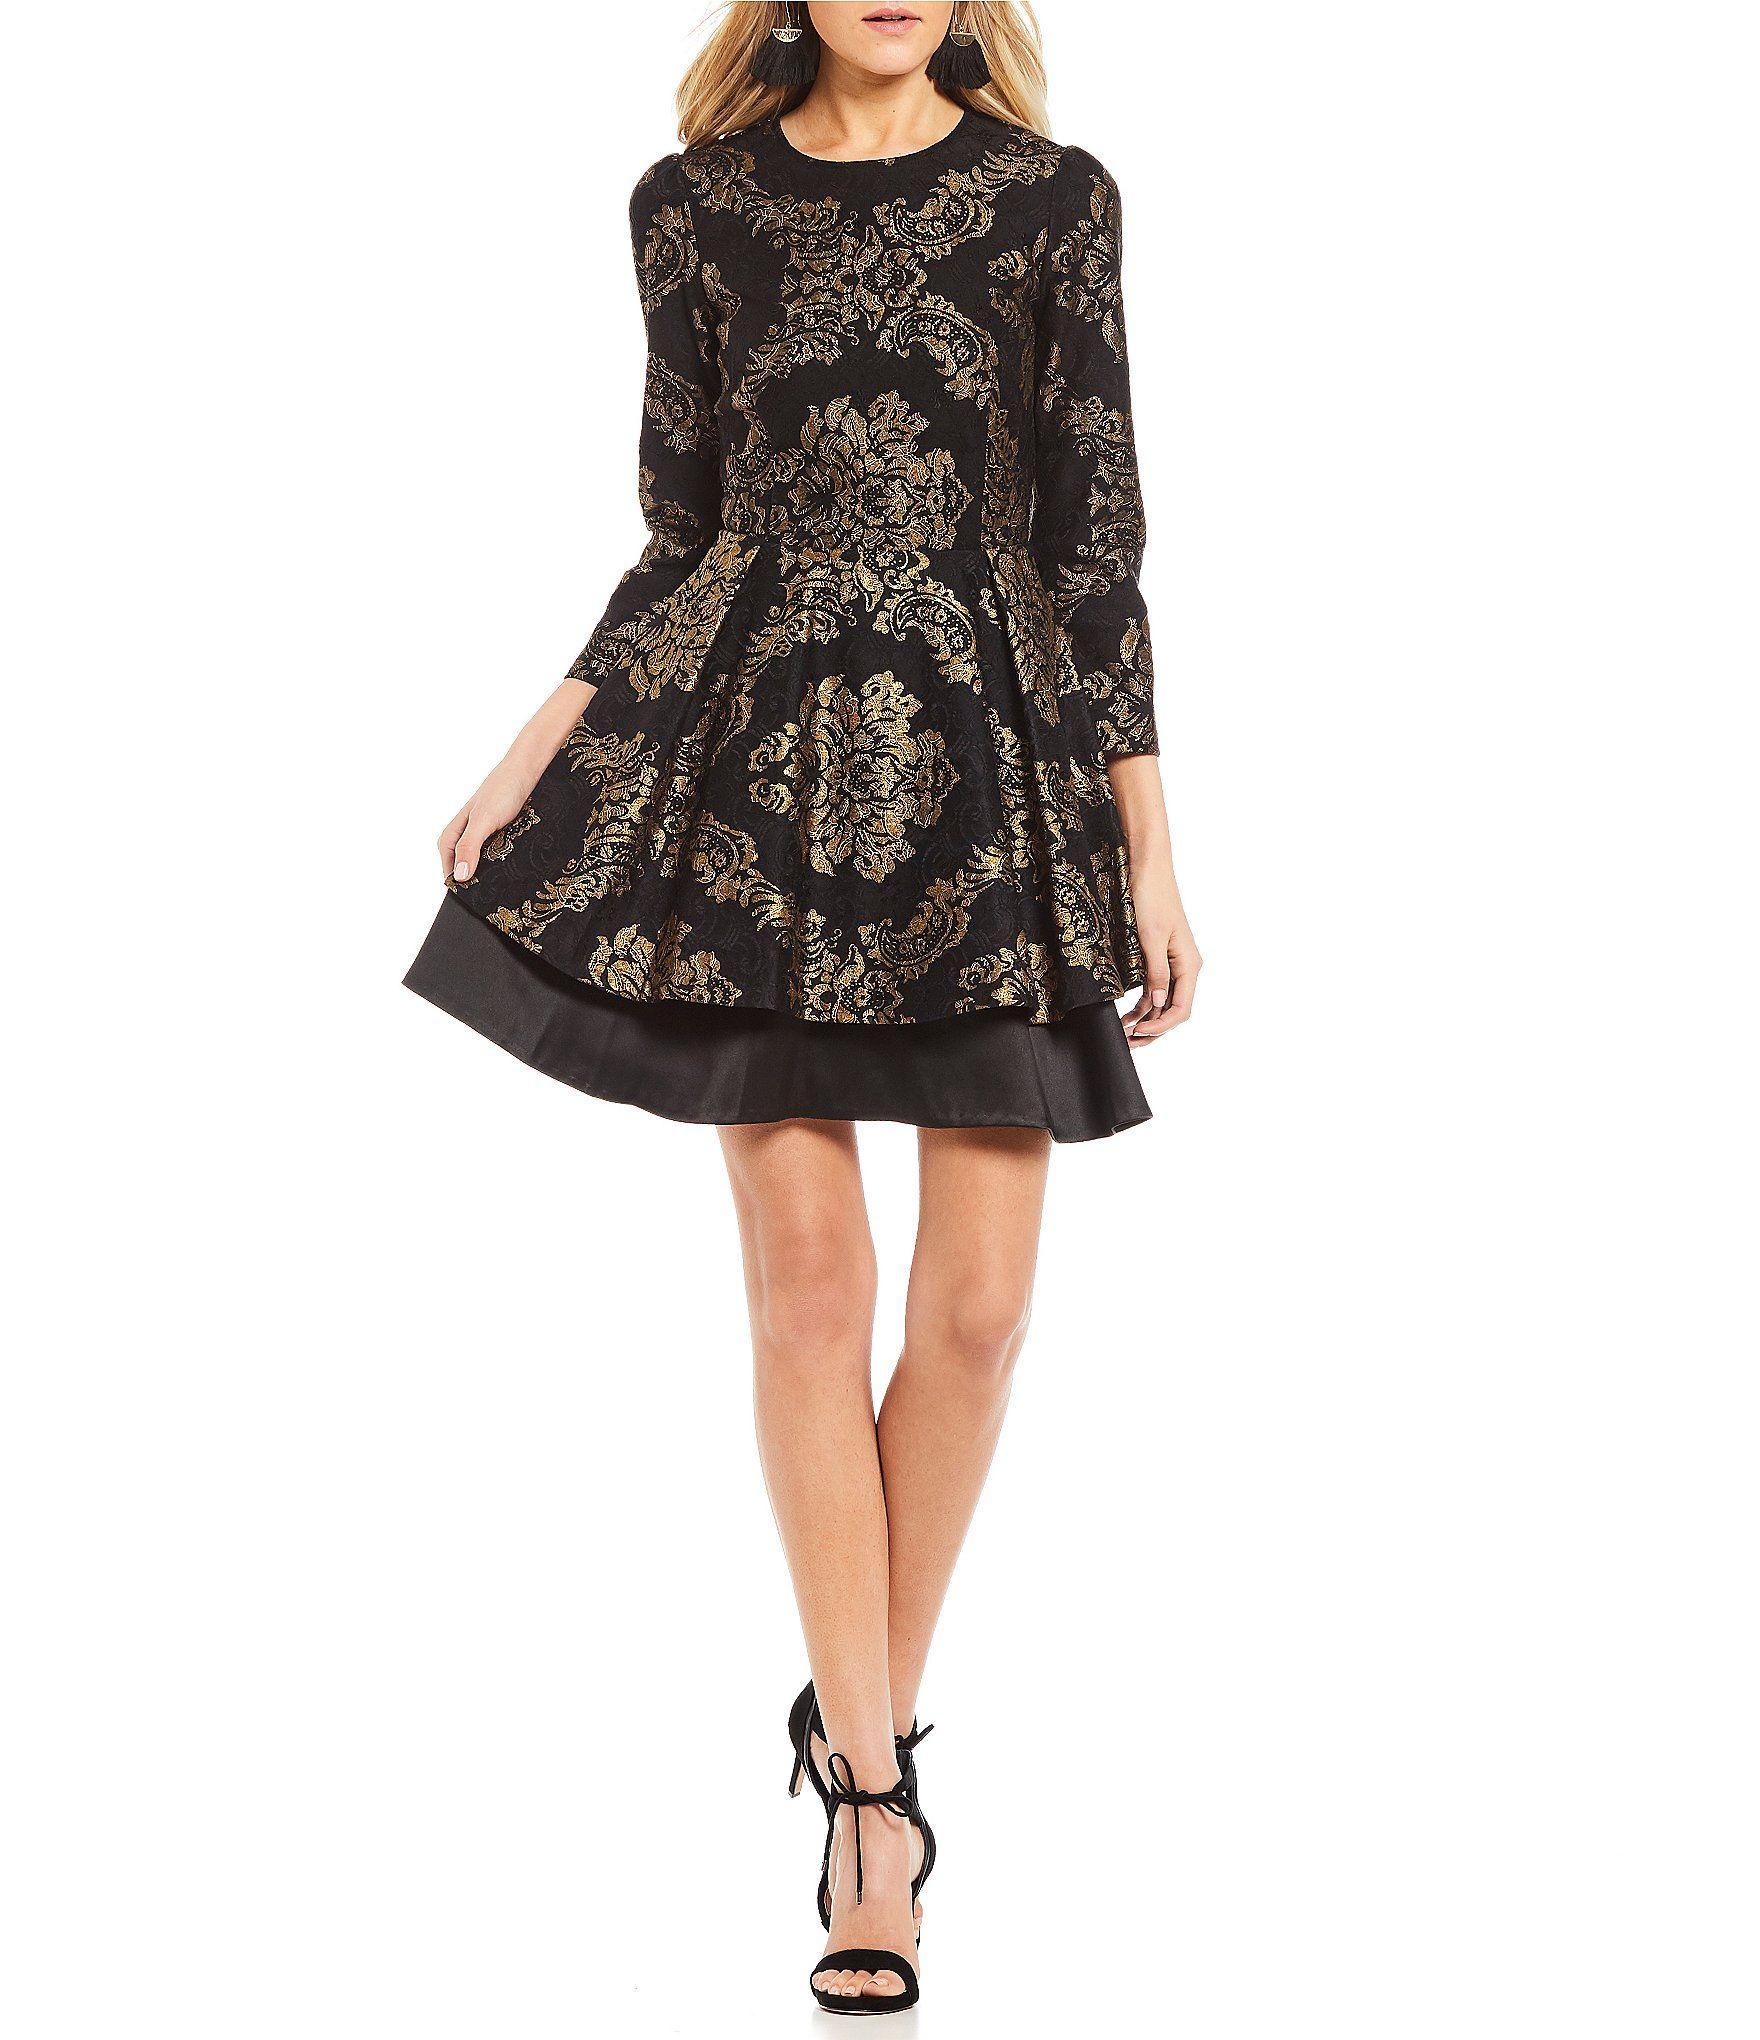 Gianni Bini Kyli Brocade Dress | Brocade dresses, Dillards and ...